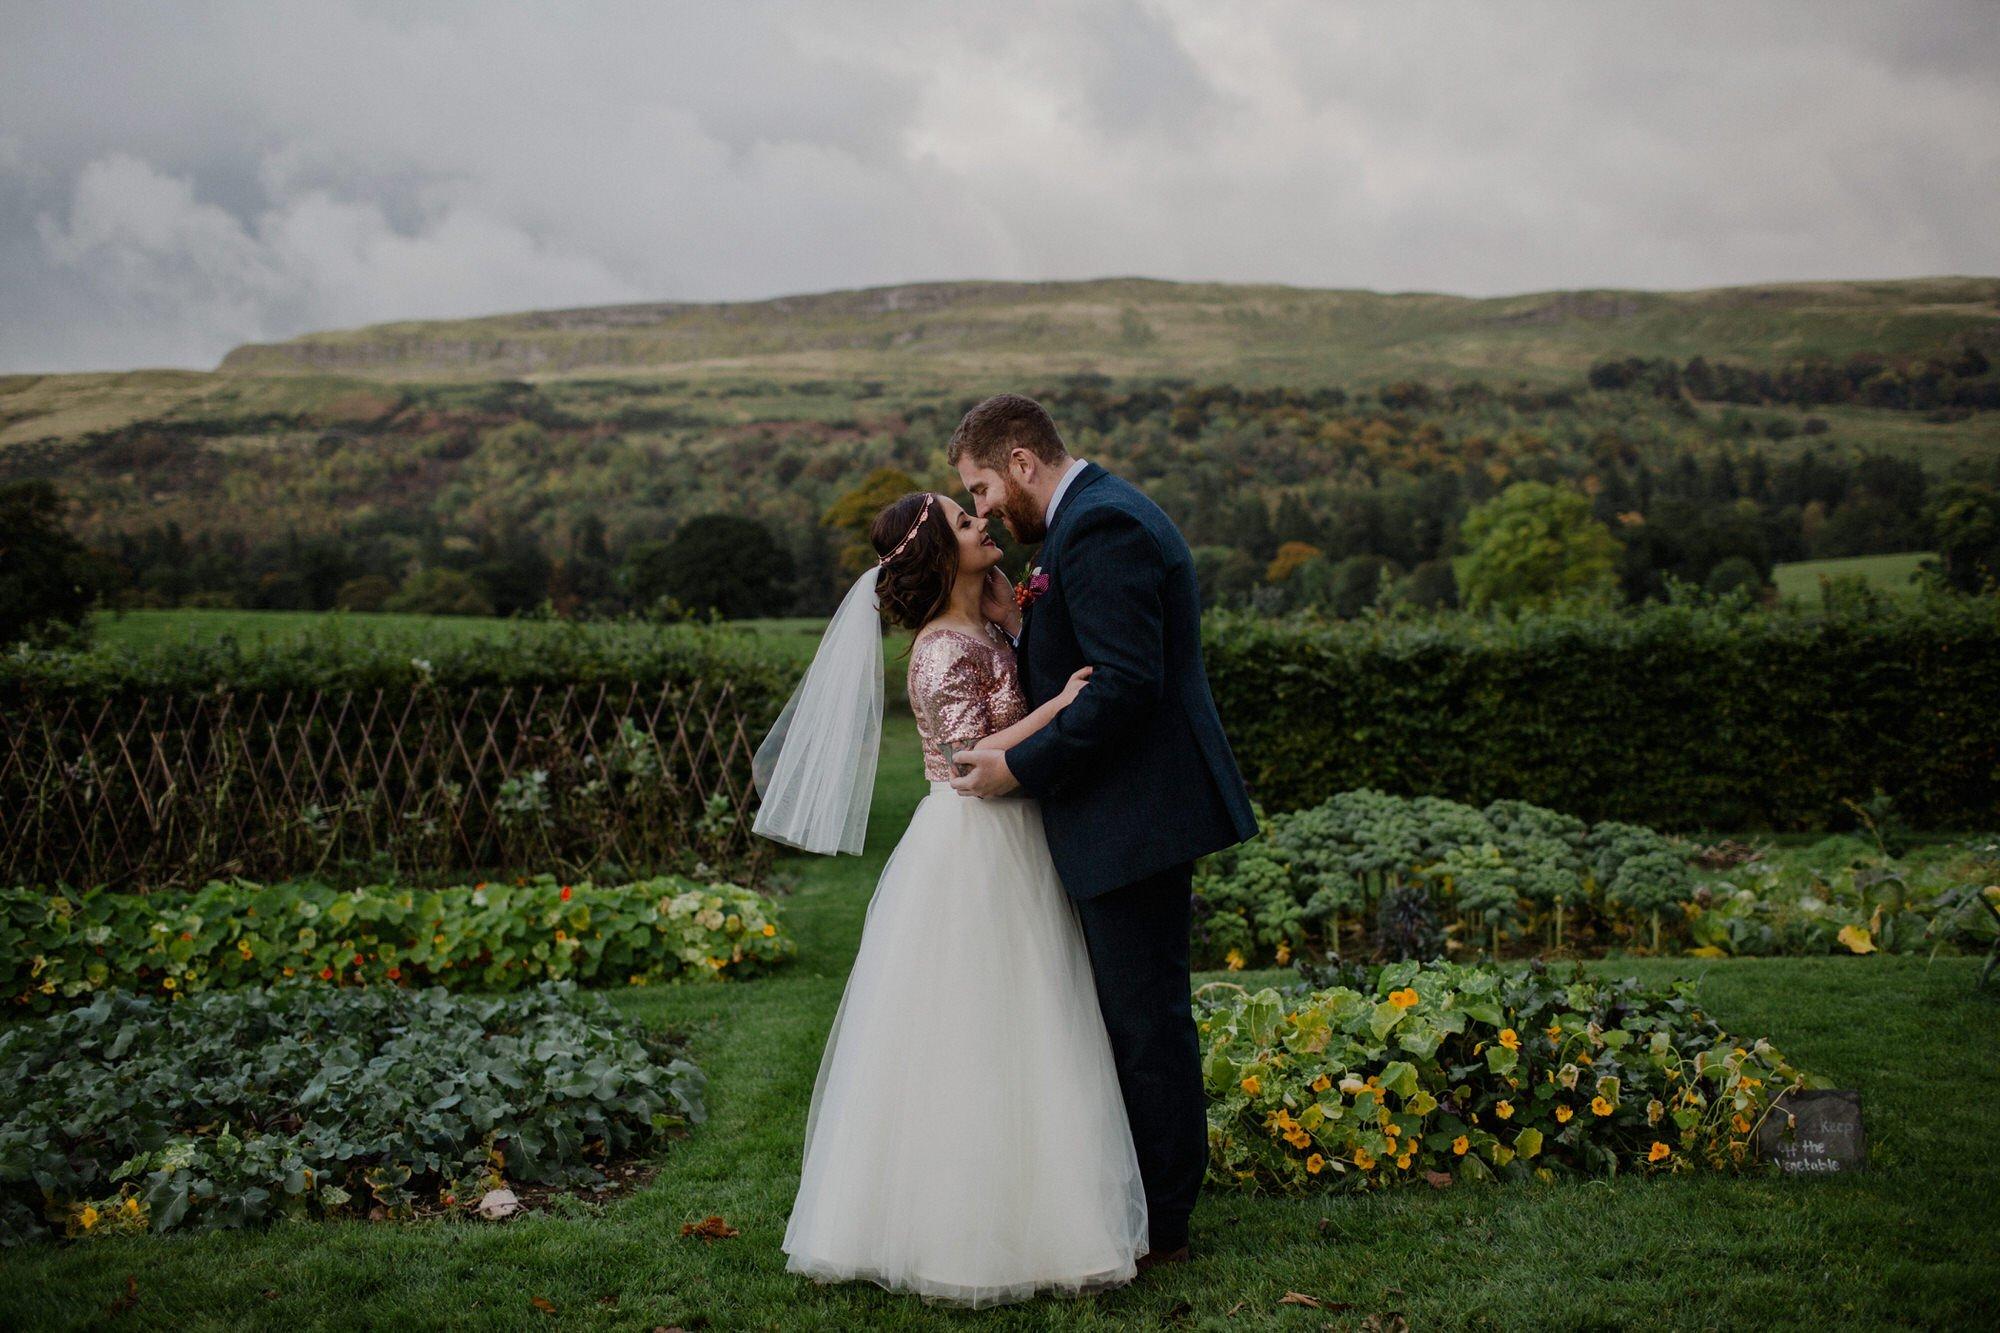 053 TIN SHED KNOCKRAICH FARM WEDDING OUTDOOR CEREMONY ALTERNATIVE BRIDE ZOE ALEXANDRA PHOTOGRAPHY